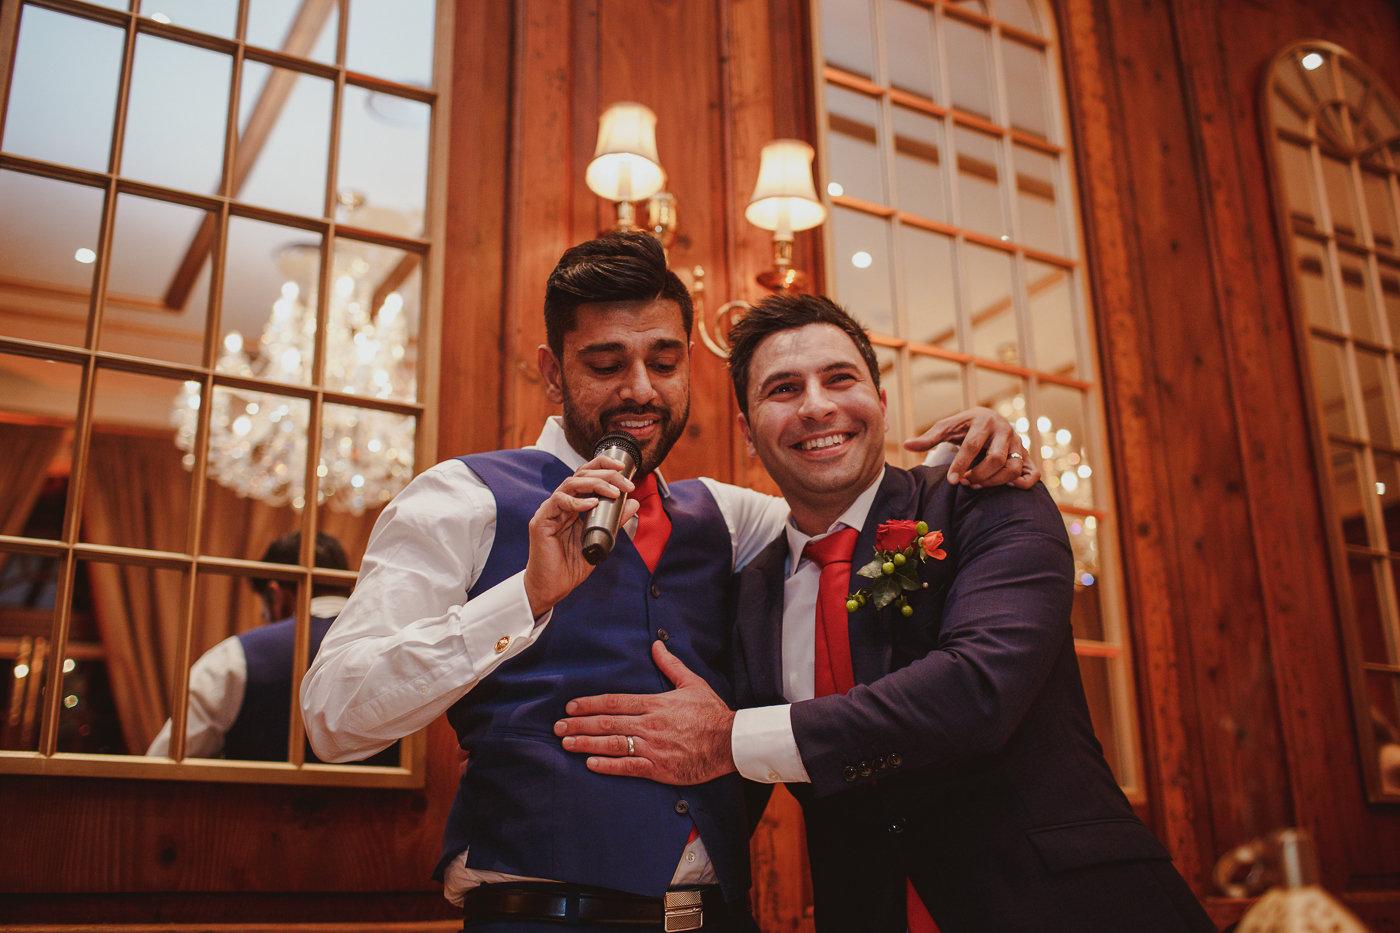 hedsor-house-wedding-photography-32.jpg